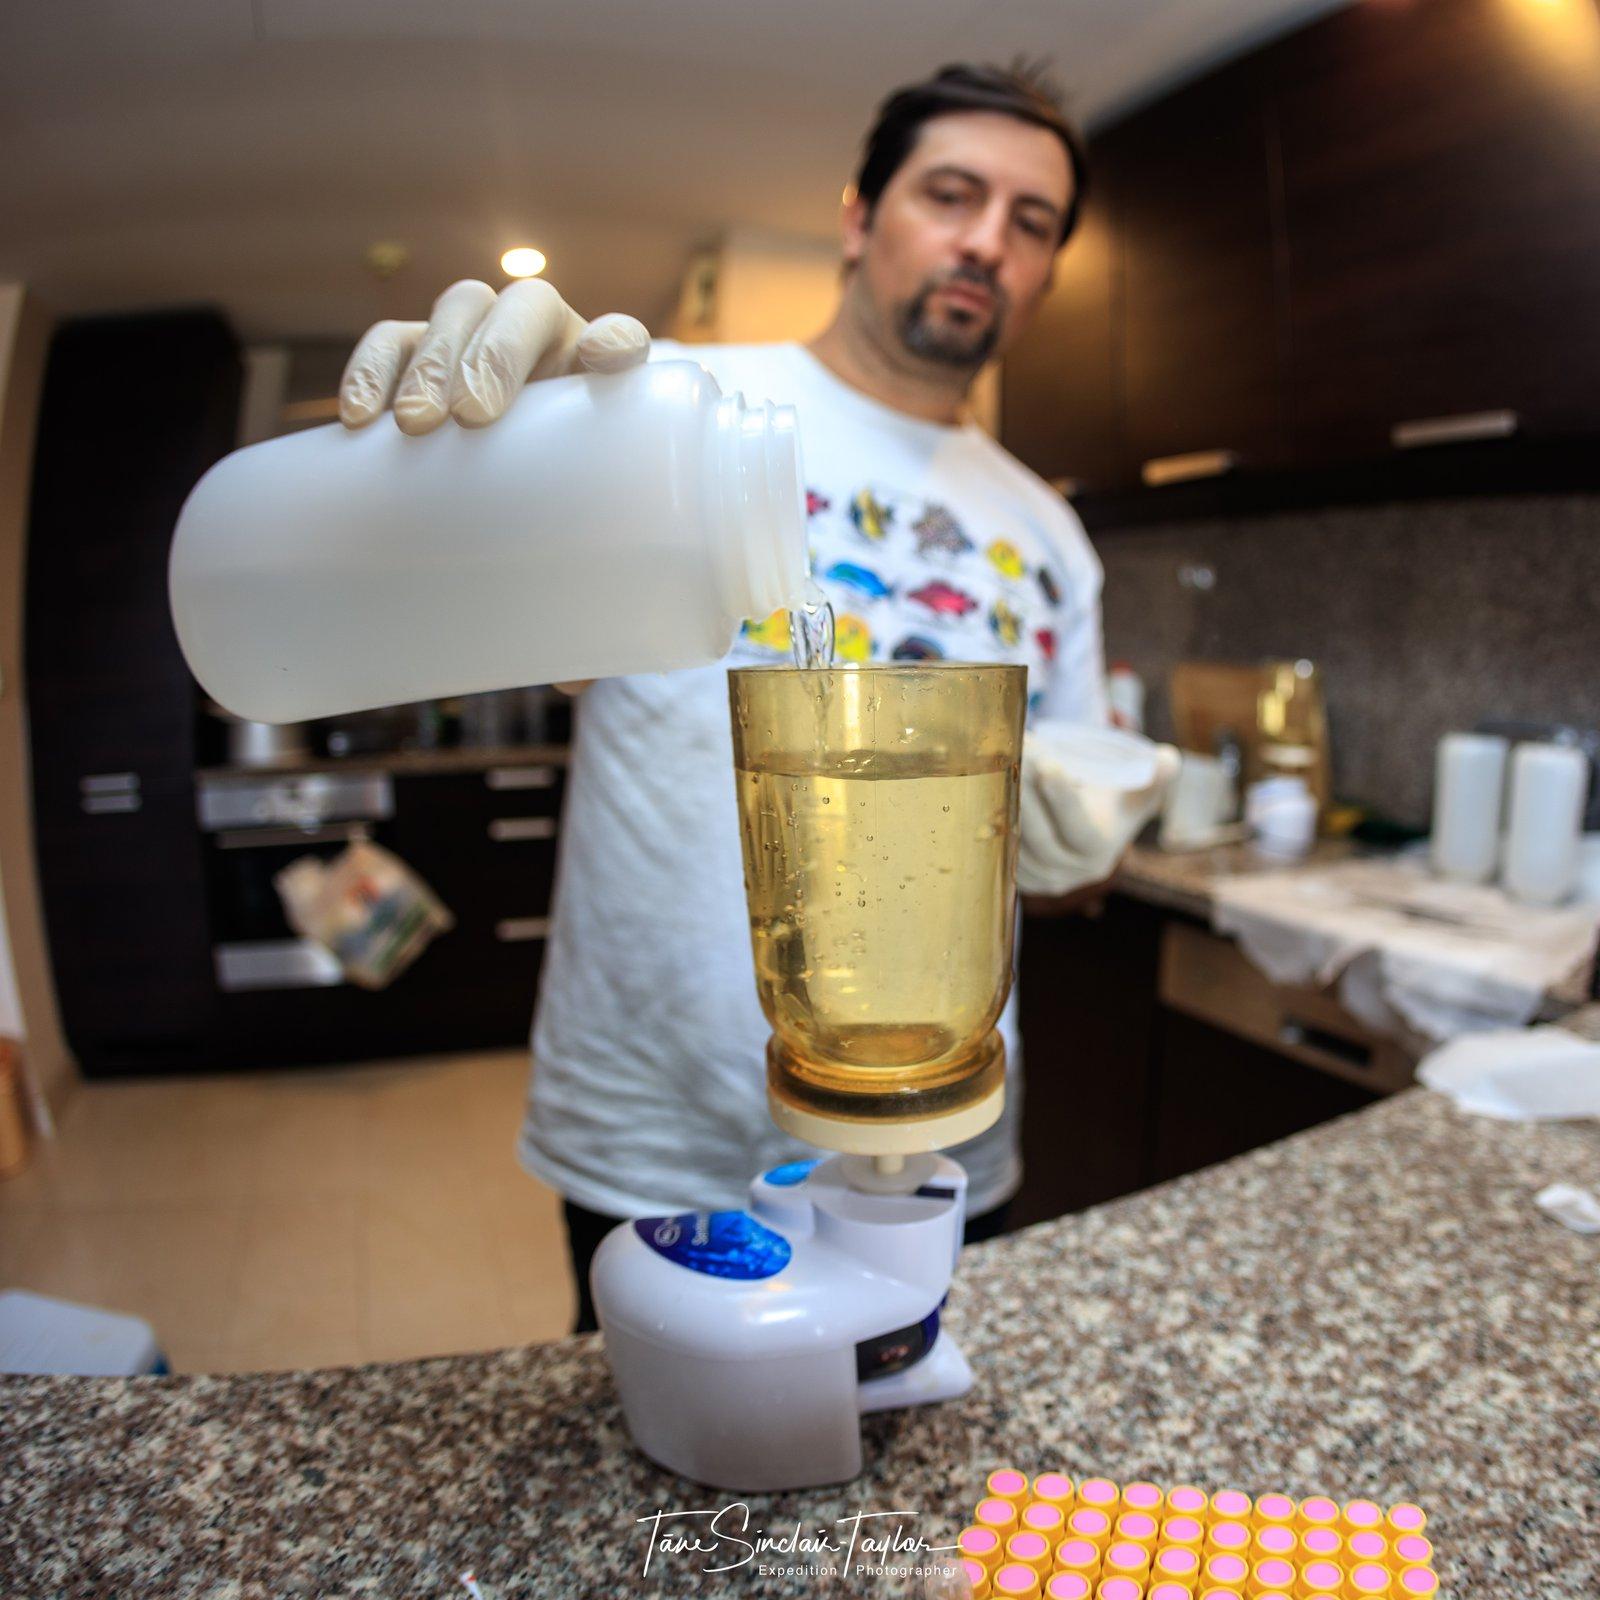 Dr Joseph DiBattista filters seawater in Oman.